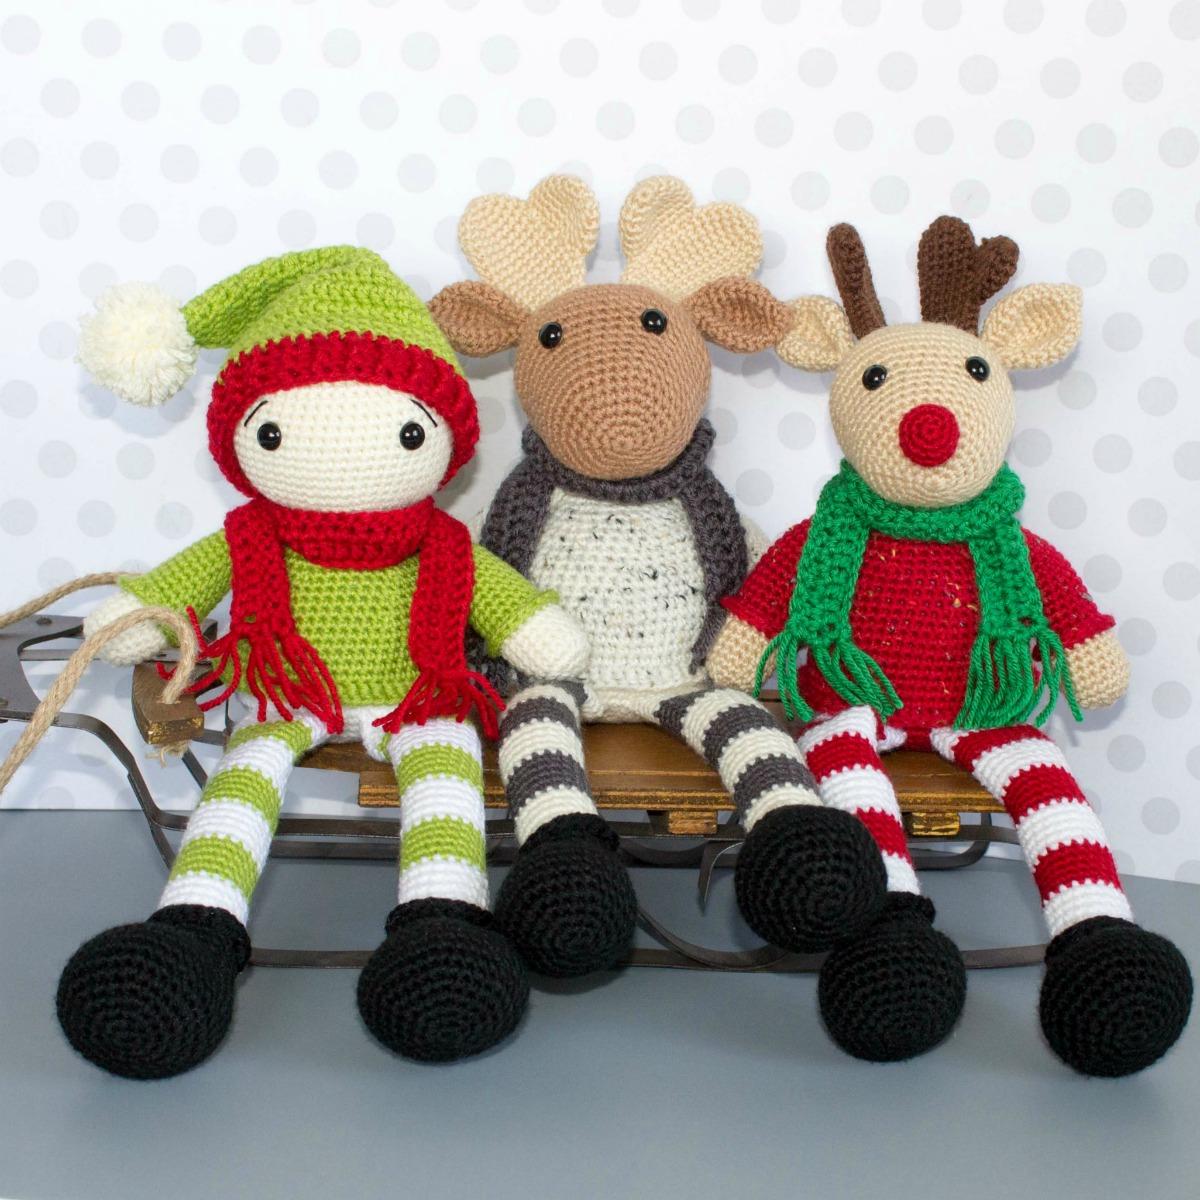 Free Crochet Moose And Crochet Reindeer Pattern